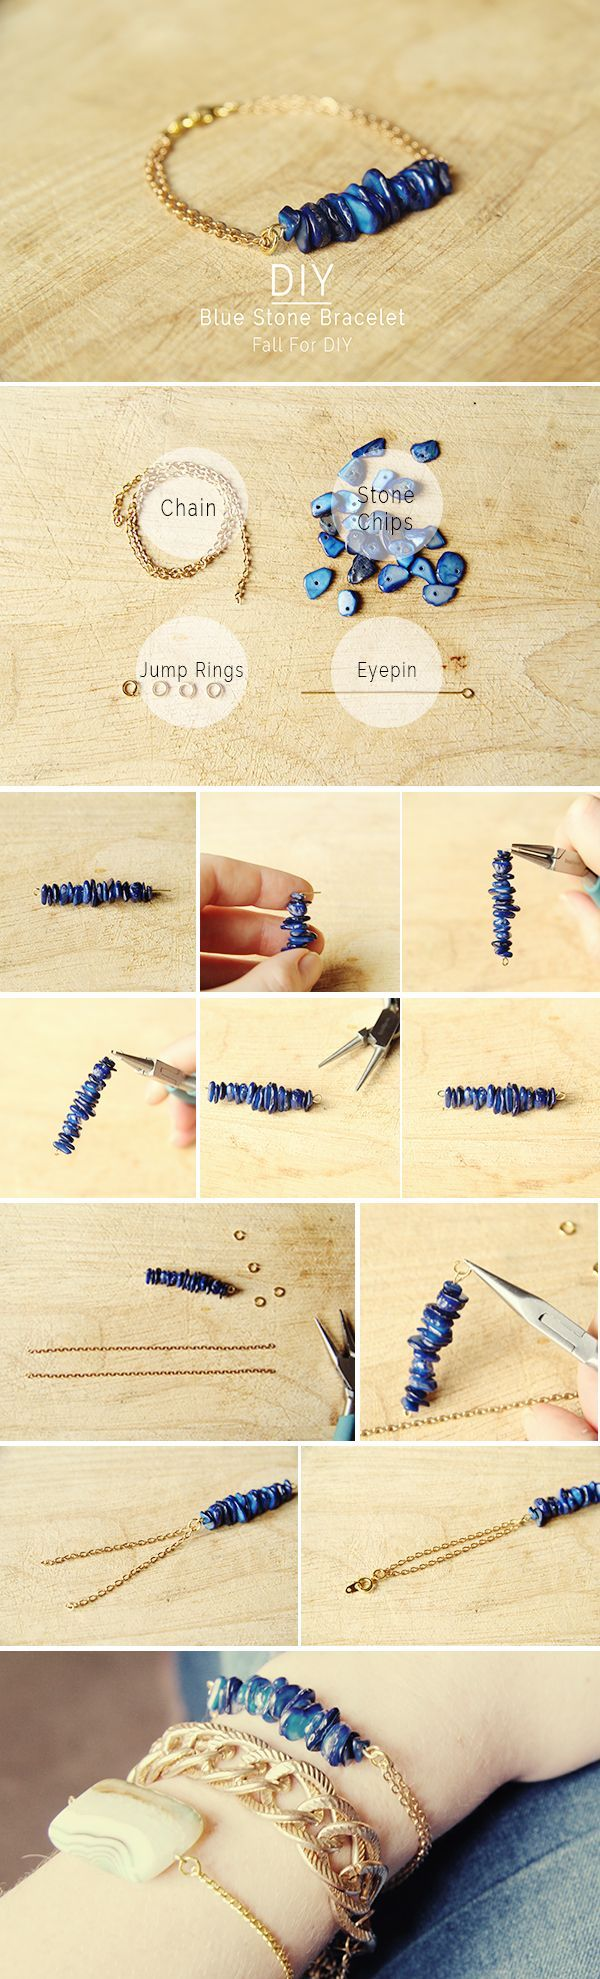 Photo of DIY Blue Stone Bracelet! So easy and beautiful! #diybracelet #coolbraceletdiy #b…